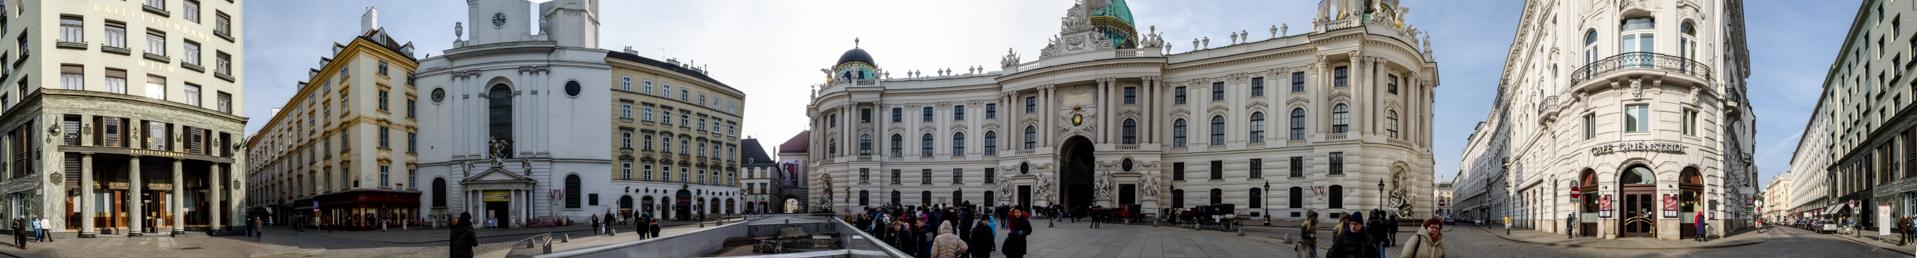 Panorama-Hofburg